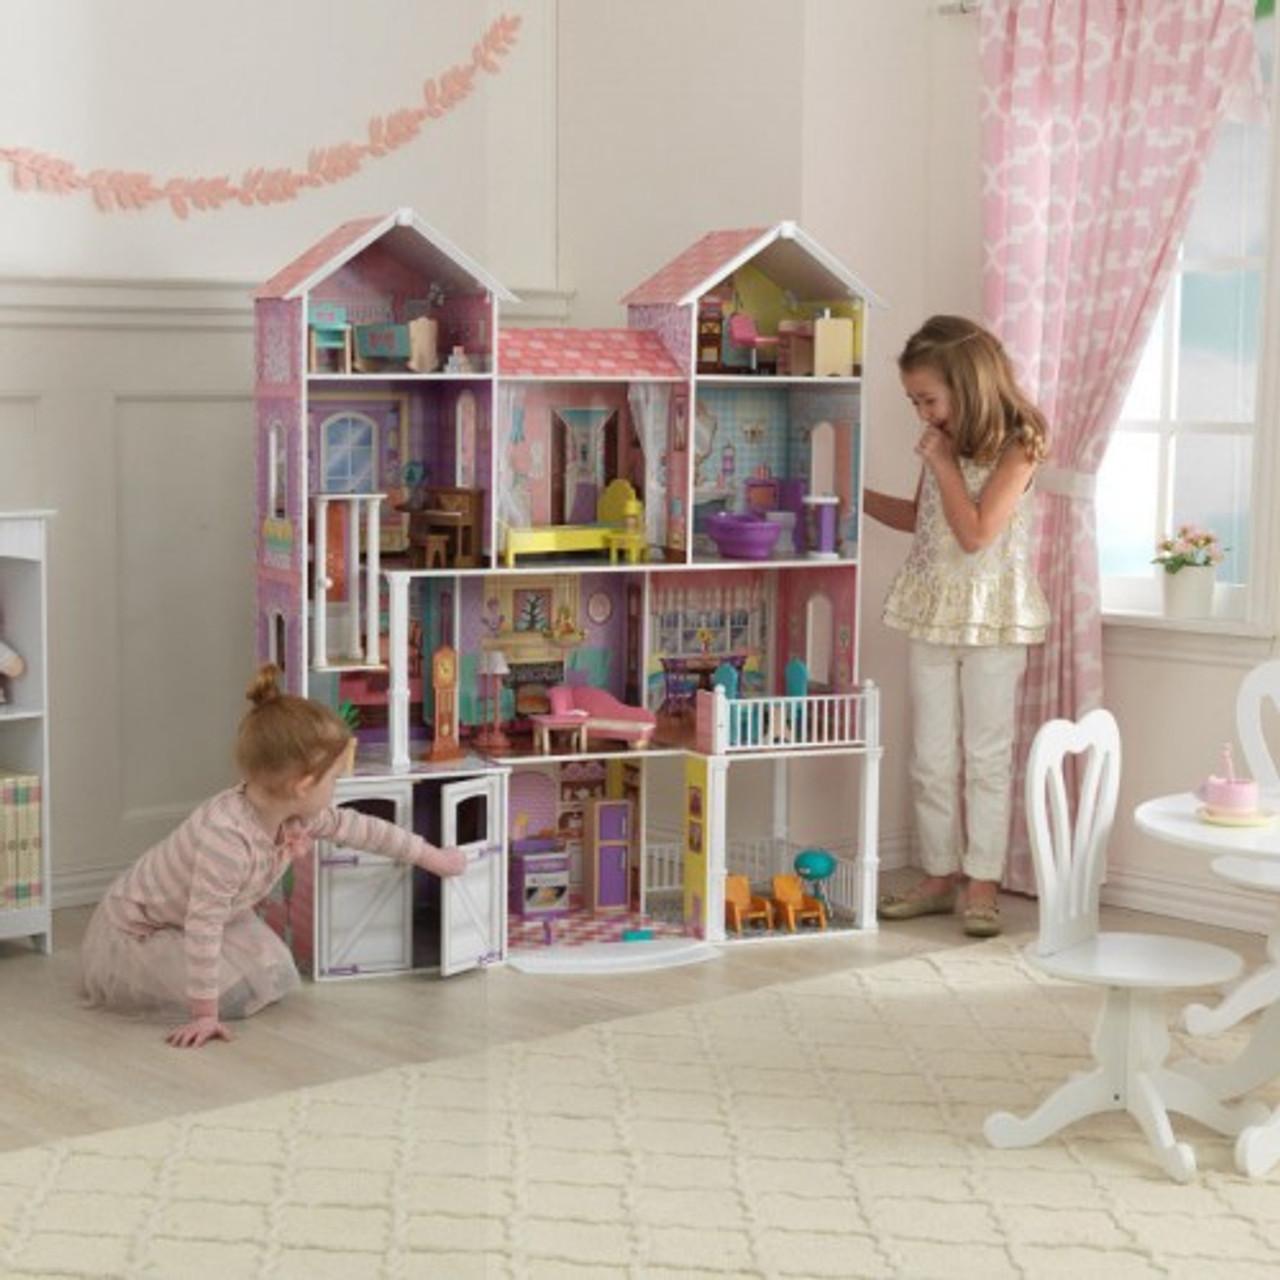 Country Estate Dollhouse Wwwfunstuffie